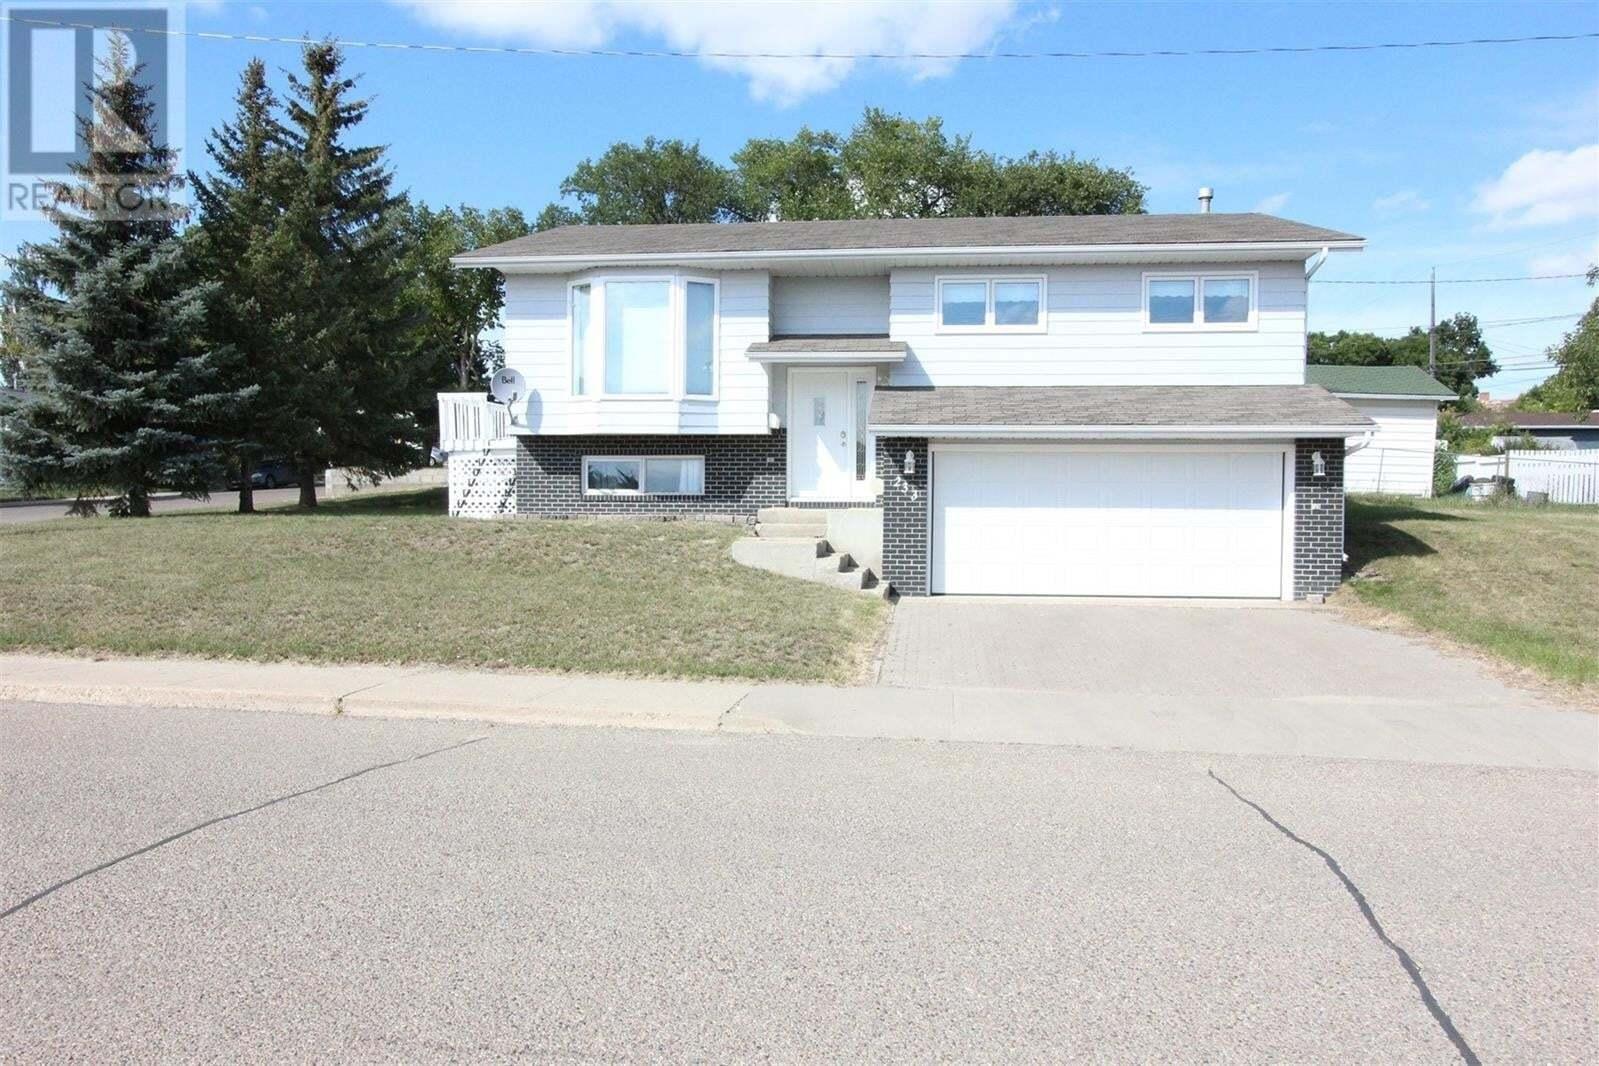 House for sale at 233 Lorne St W Swift Current Saskatchewan - MLS: SK825782